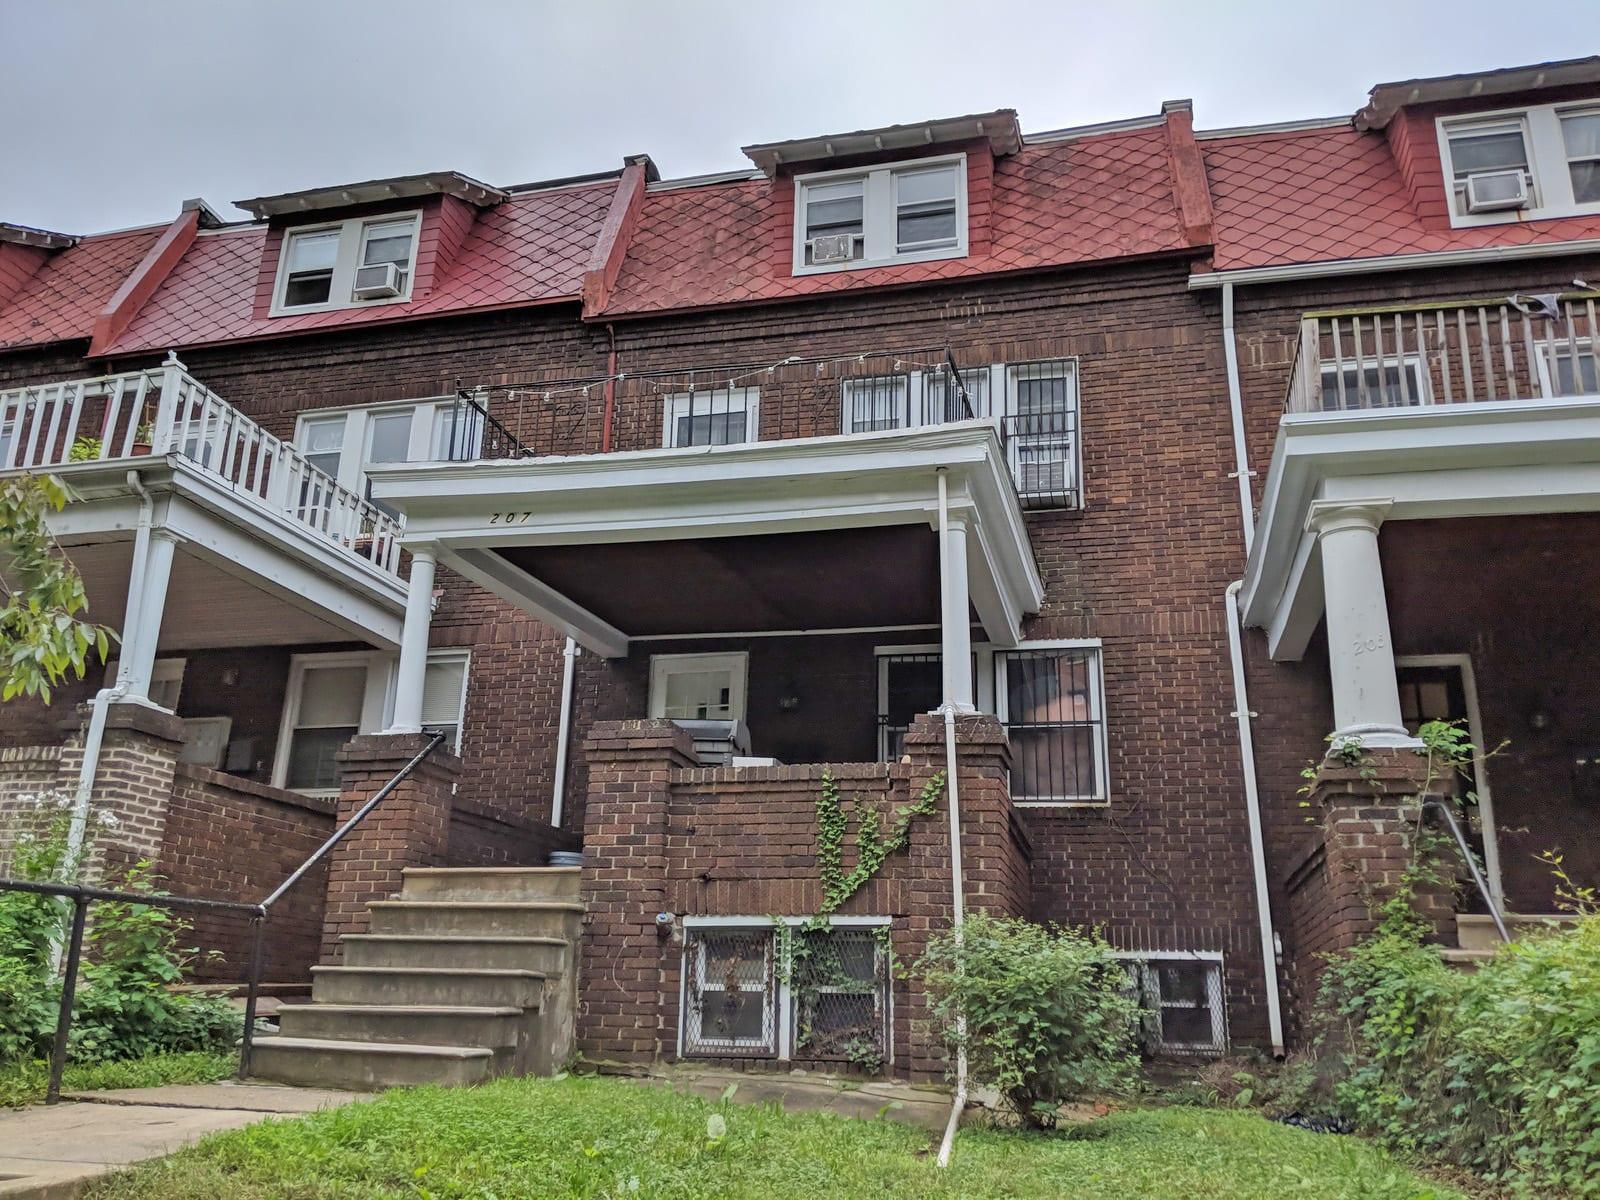 5-Bedroom Rental House Next To Johns Hopkins University